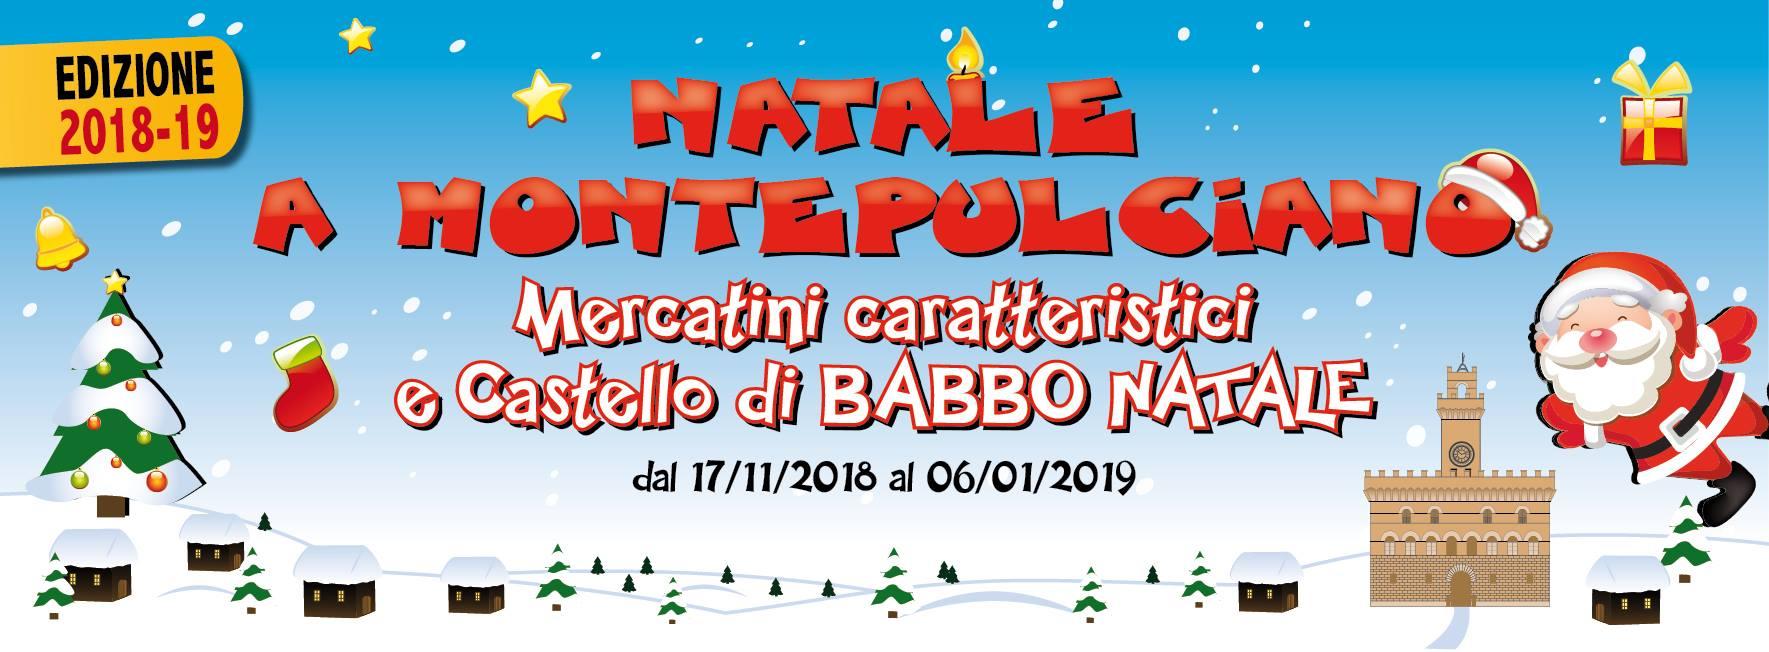 Mercatini di Natale 2018 a Montepulciano